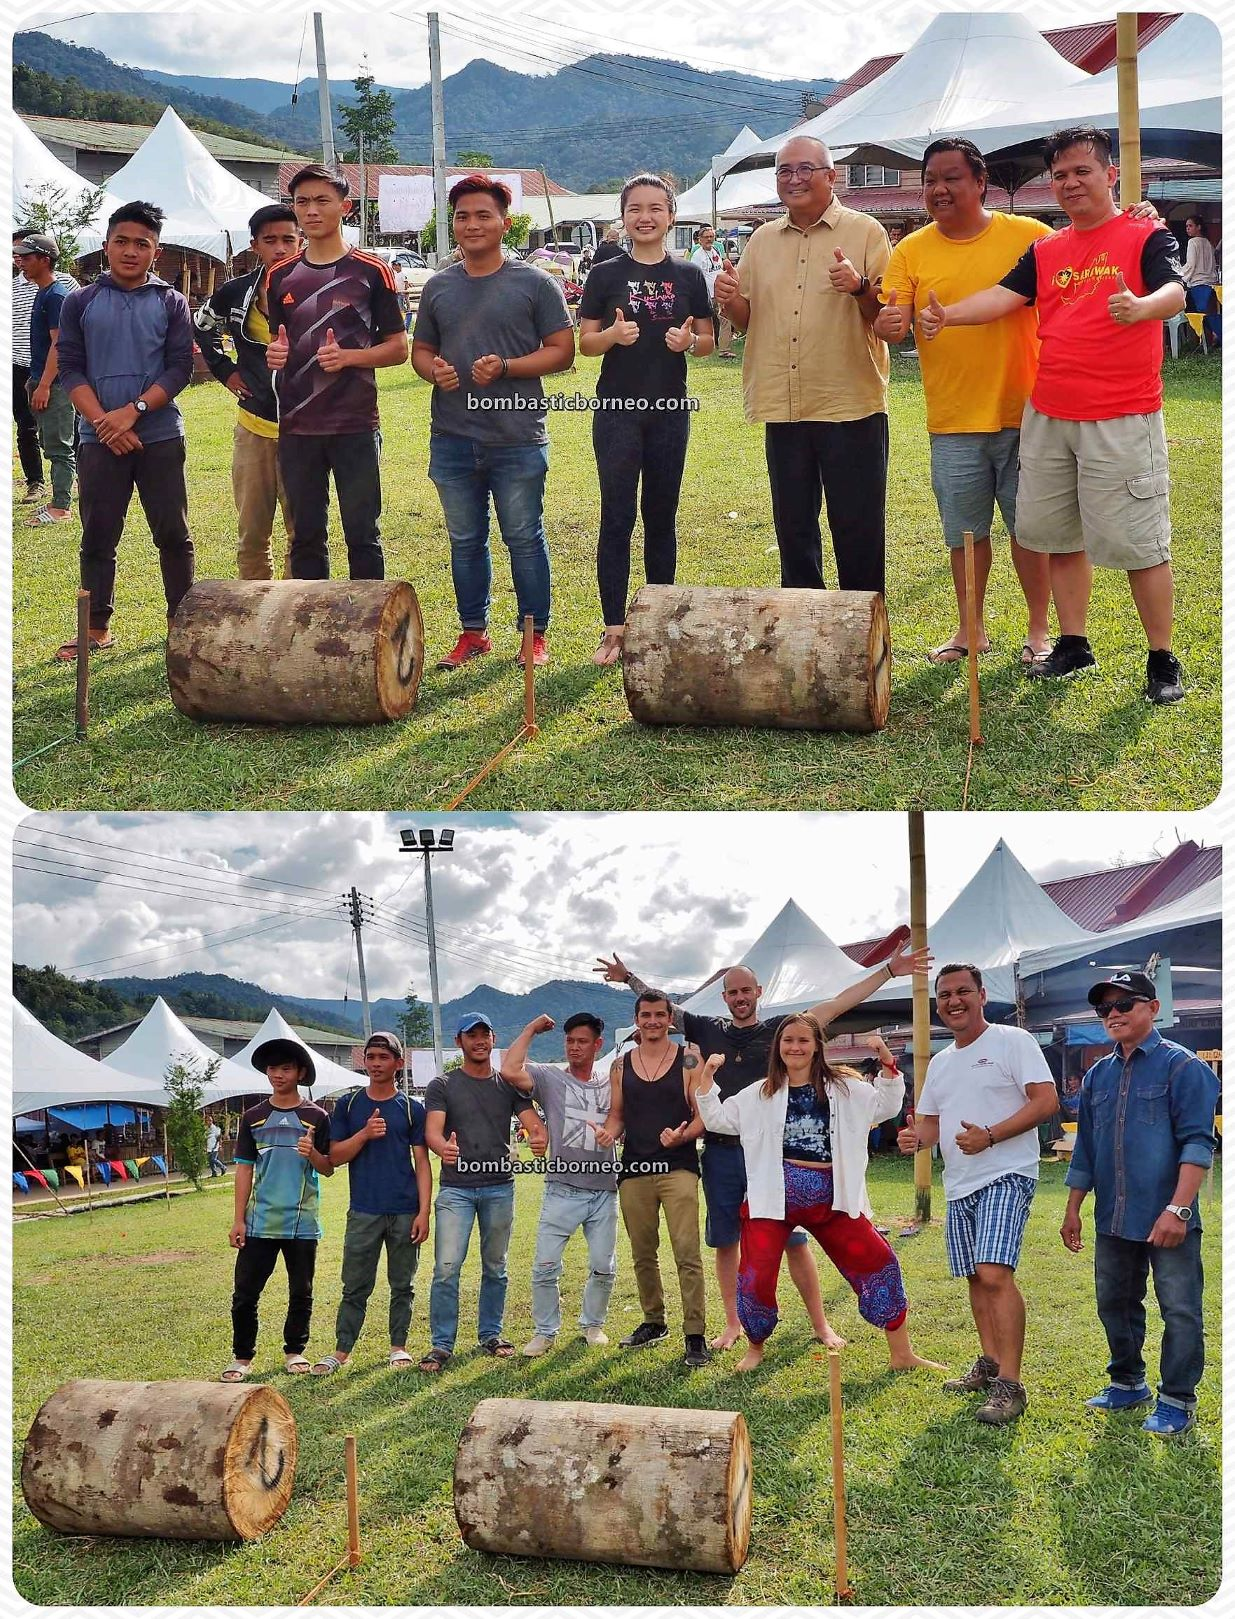 Pesta Nukenen, Bario Food Culture Festival, traditional, authentic, backpackers, Dayak, Orang Ulu, tribal, Kelabit Highlands, event, Malaysia, Tourism, 跨境婆罗洲游踪, 巴里奥加拉毕族文化, 乌鲁人土著部落